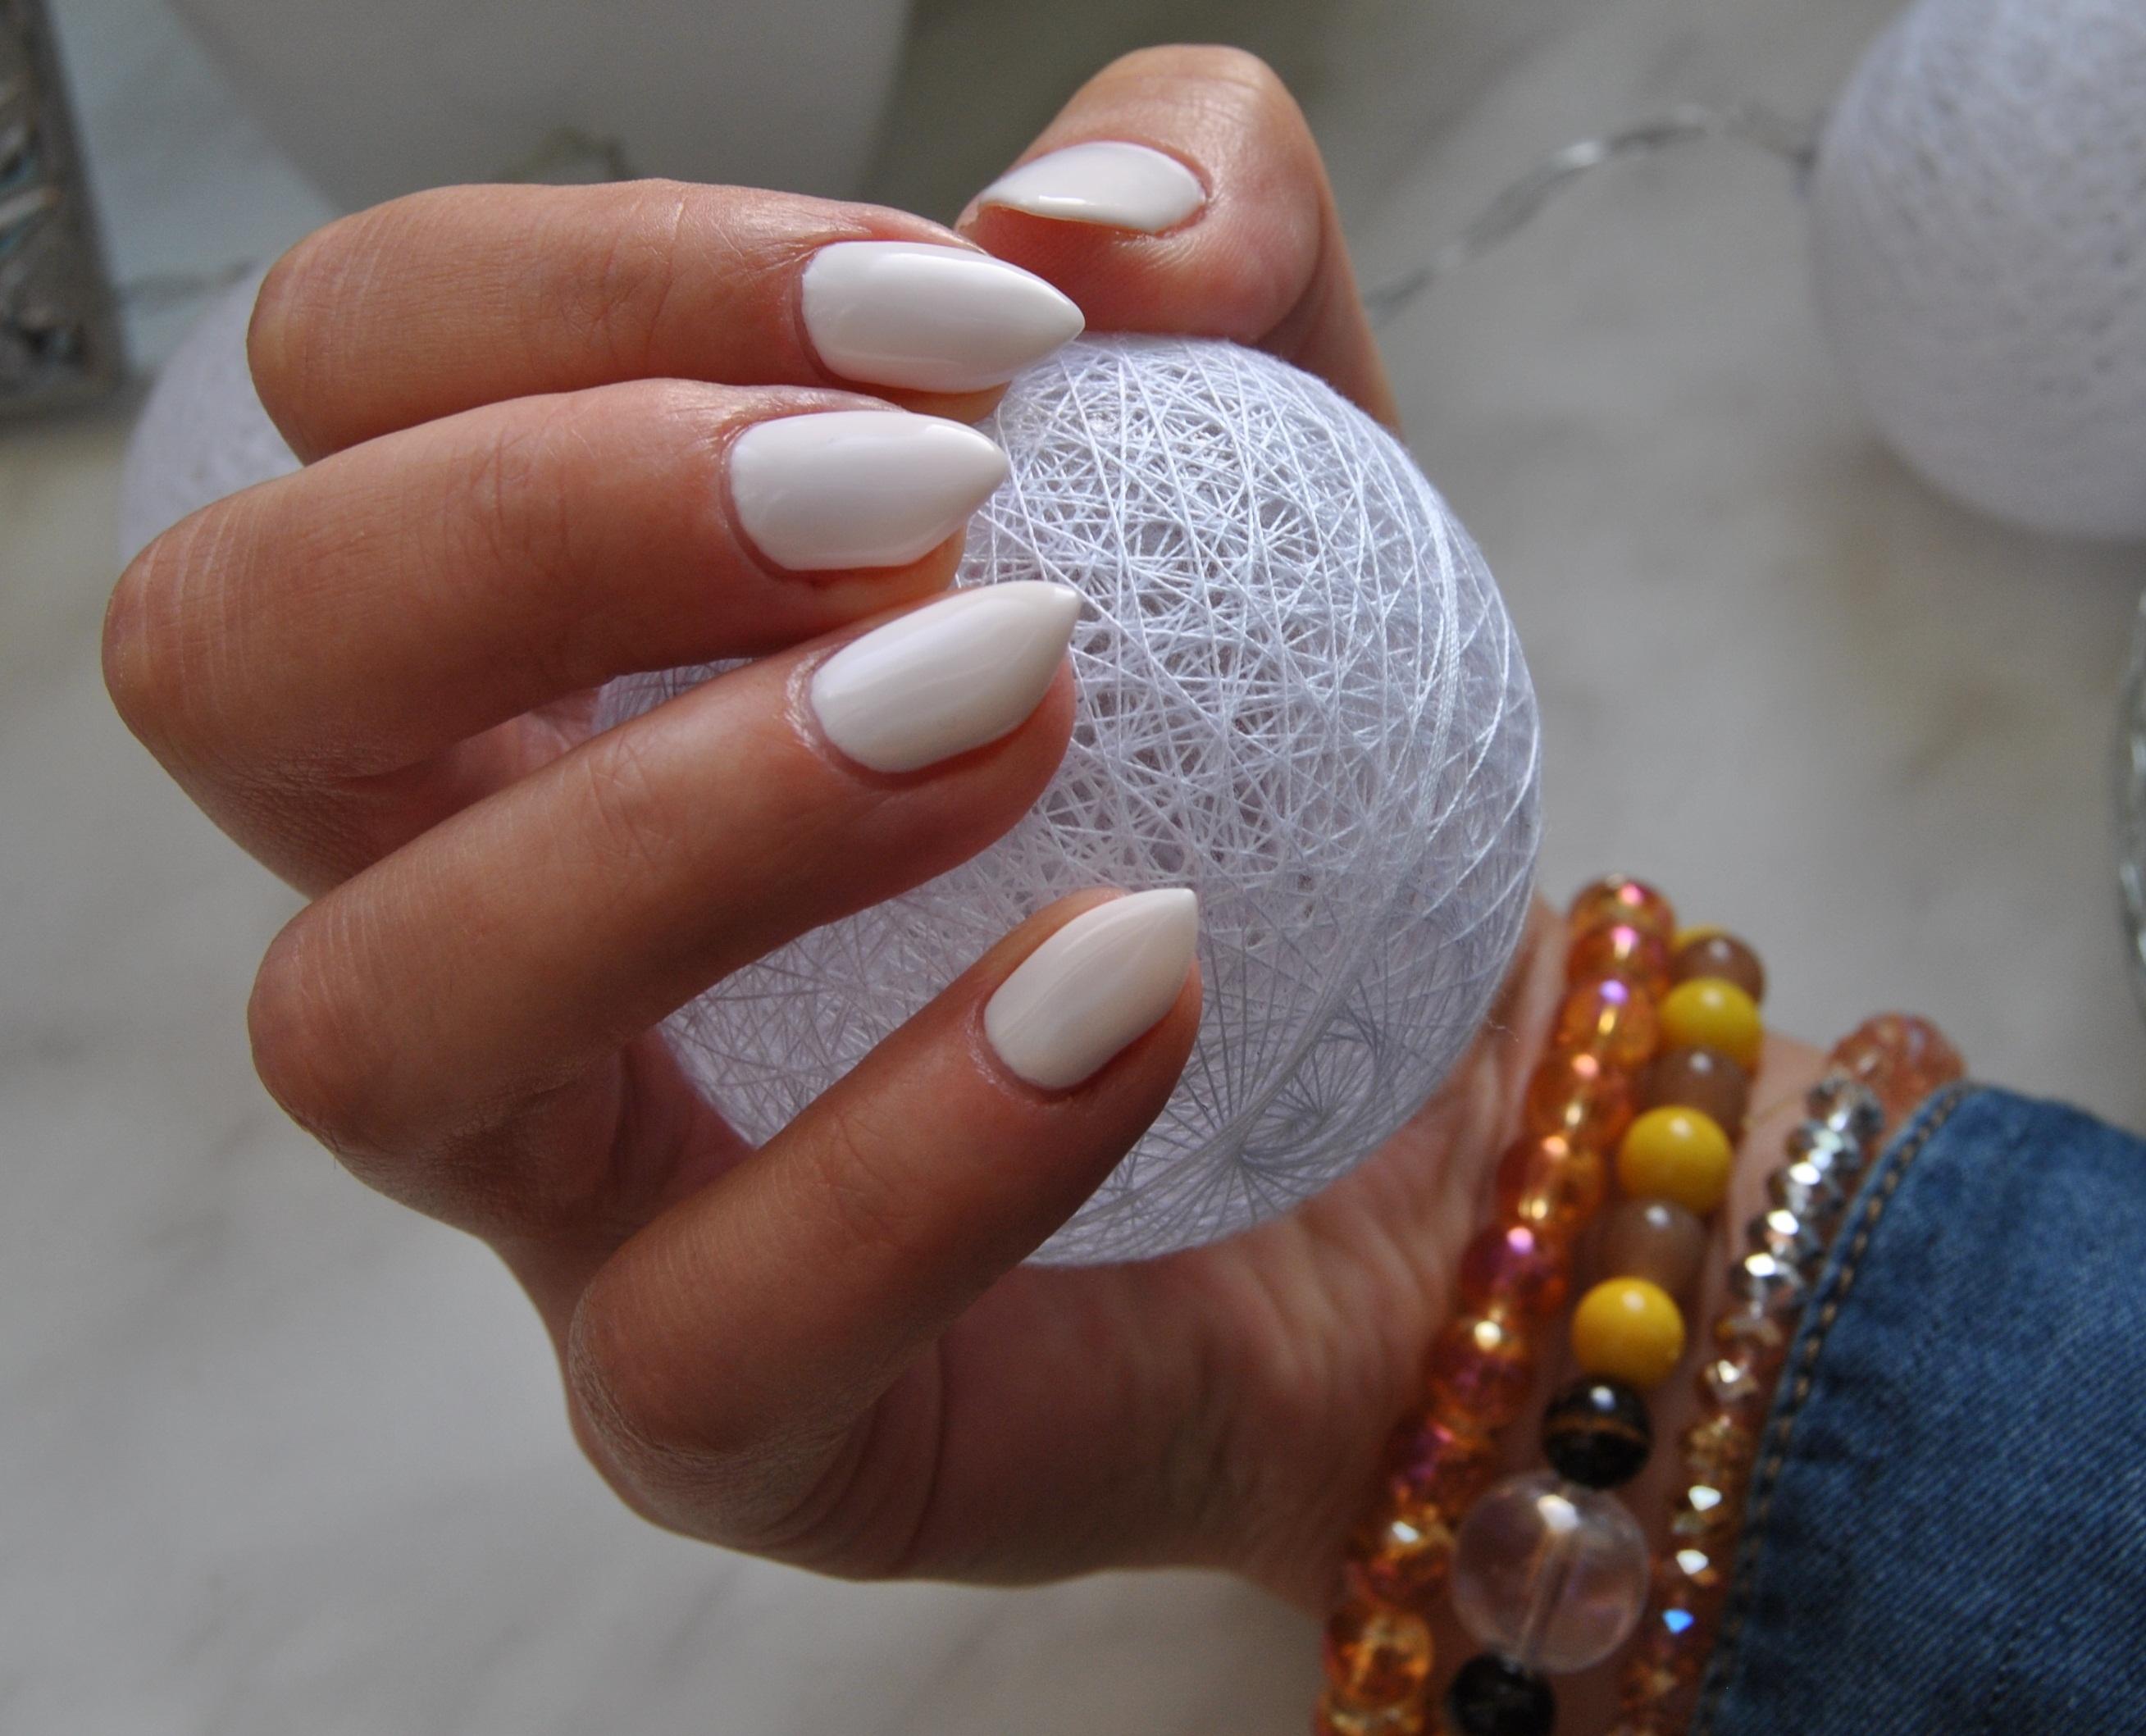 Kostenlose foto : Finger, Farbe, Nagel, Maniküre, Kunst, Hände ...